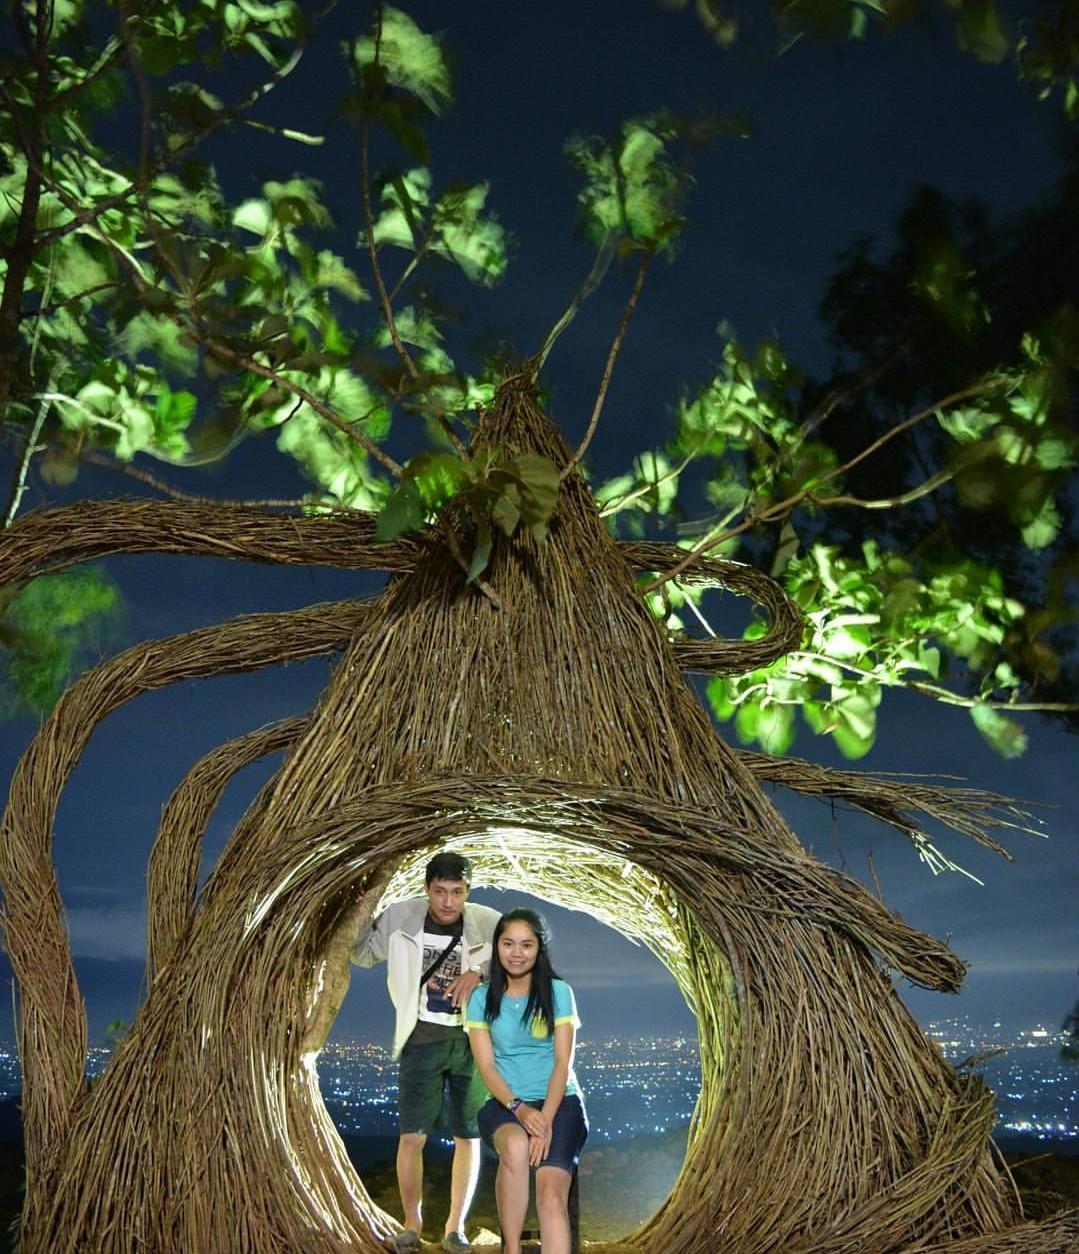 Harga Tiket Masuk Hutan Pinus Pengger Jogja Terbaru 2018